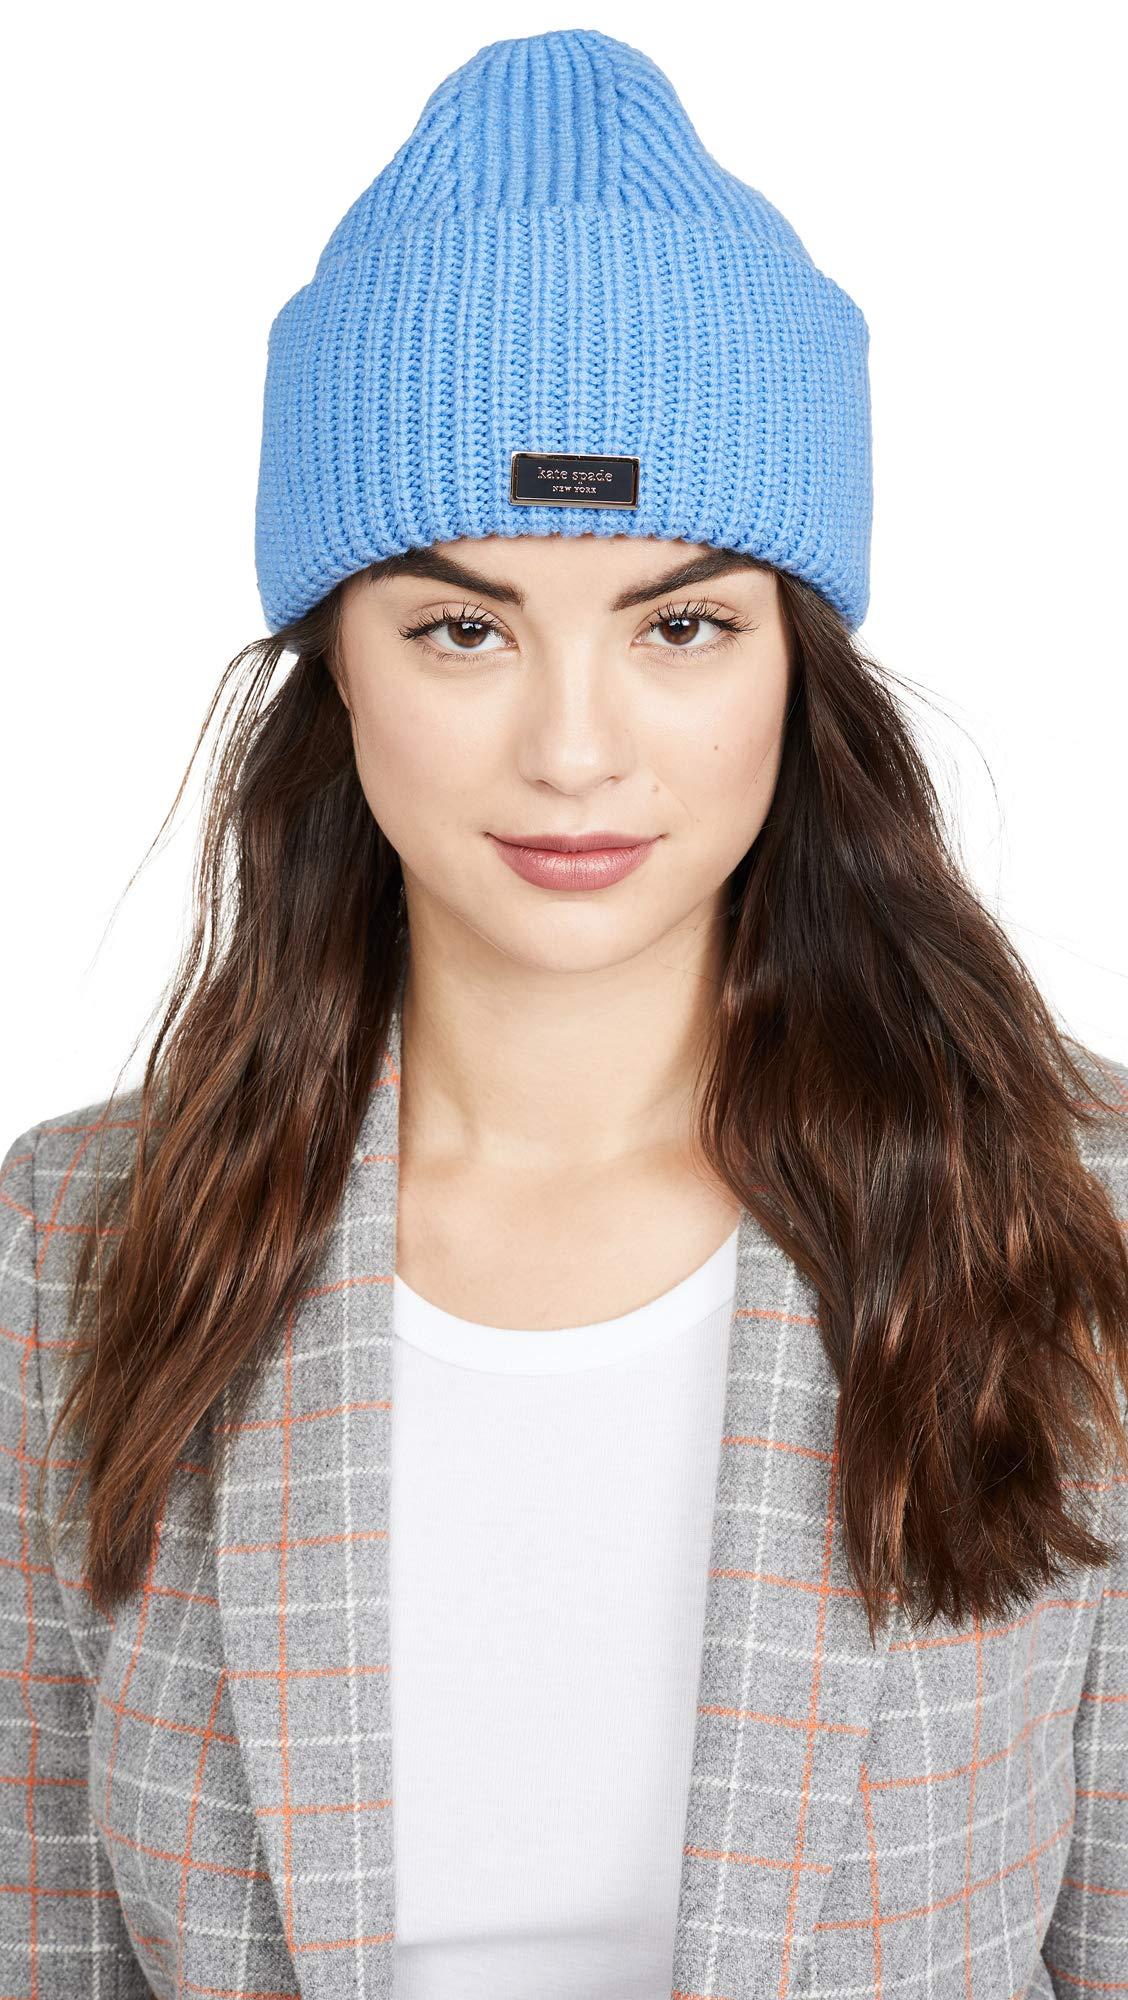 Kate Spade New York Women's Label Beanie